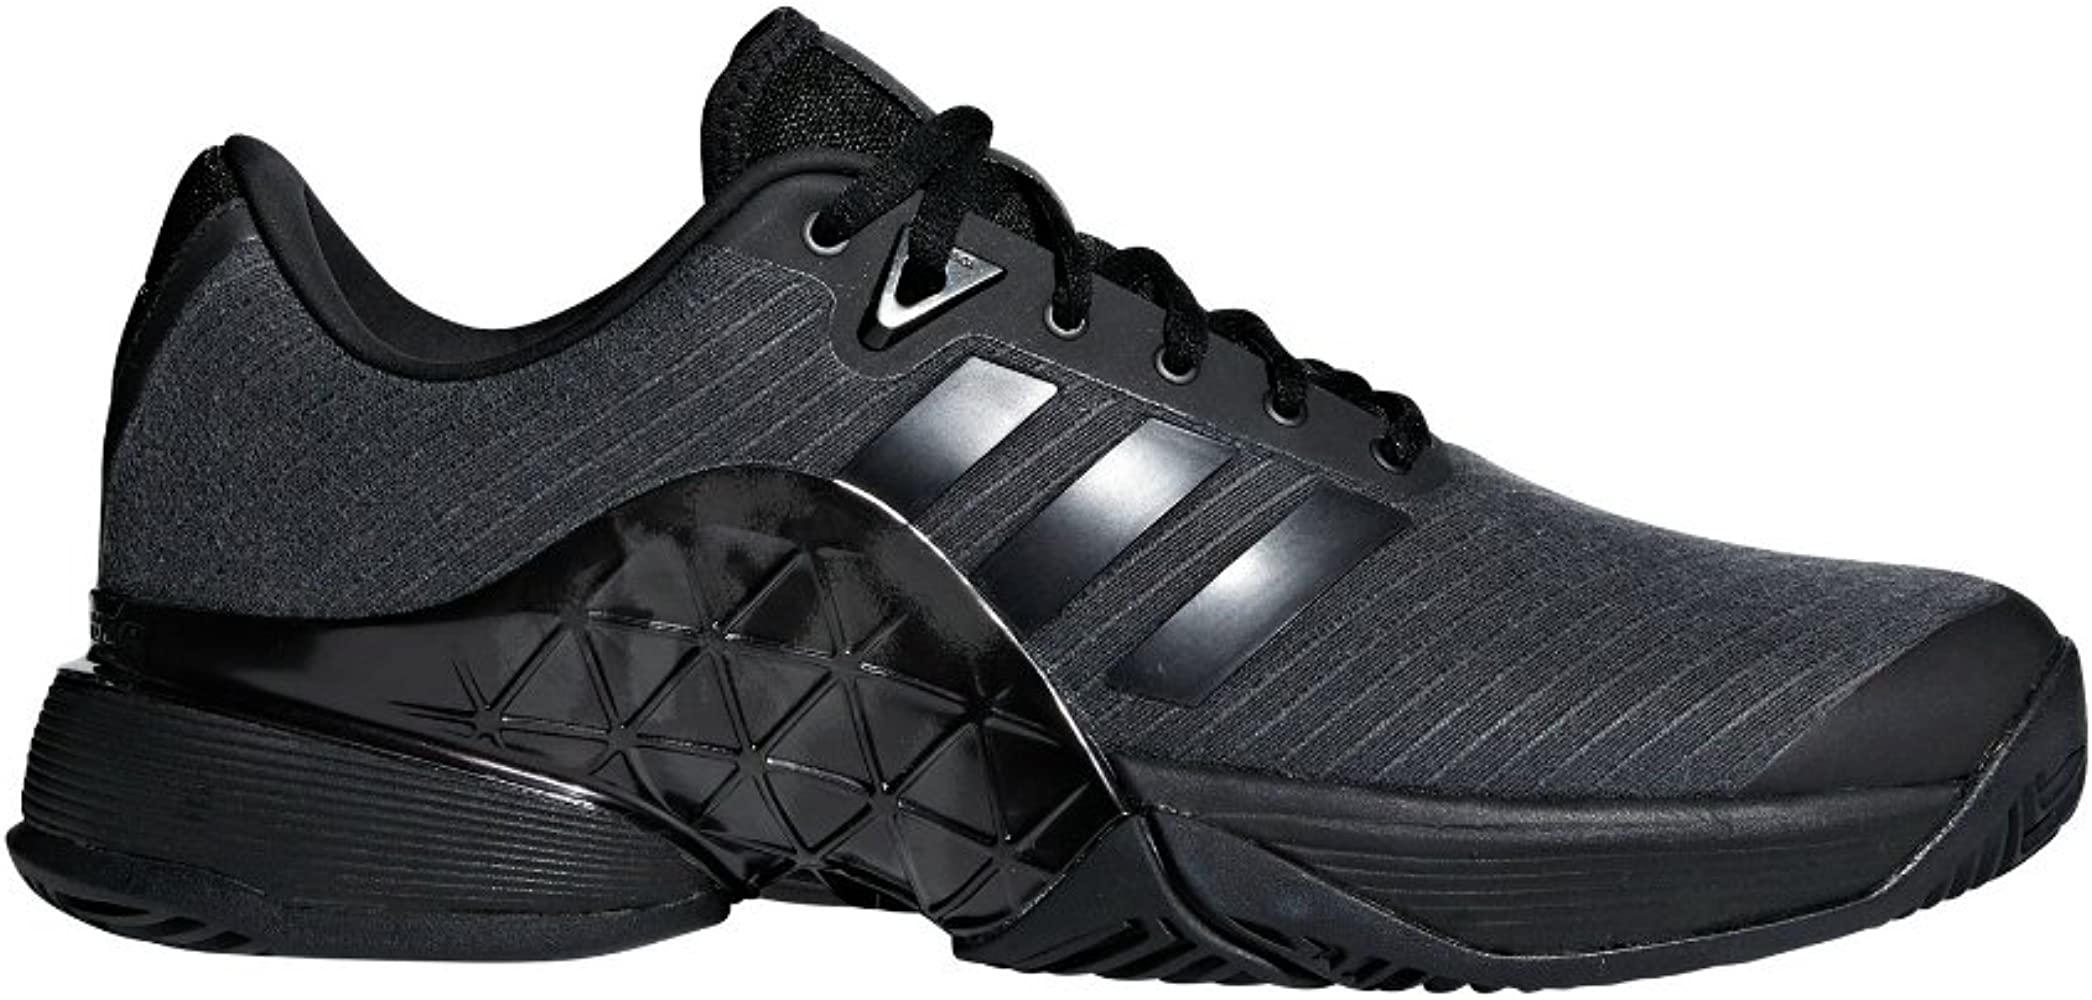 Adidas Chaussures Barricade 2018 LTD: Amazon.es: Deportes y ...